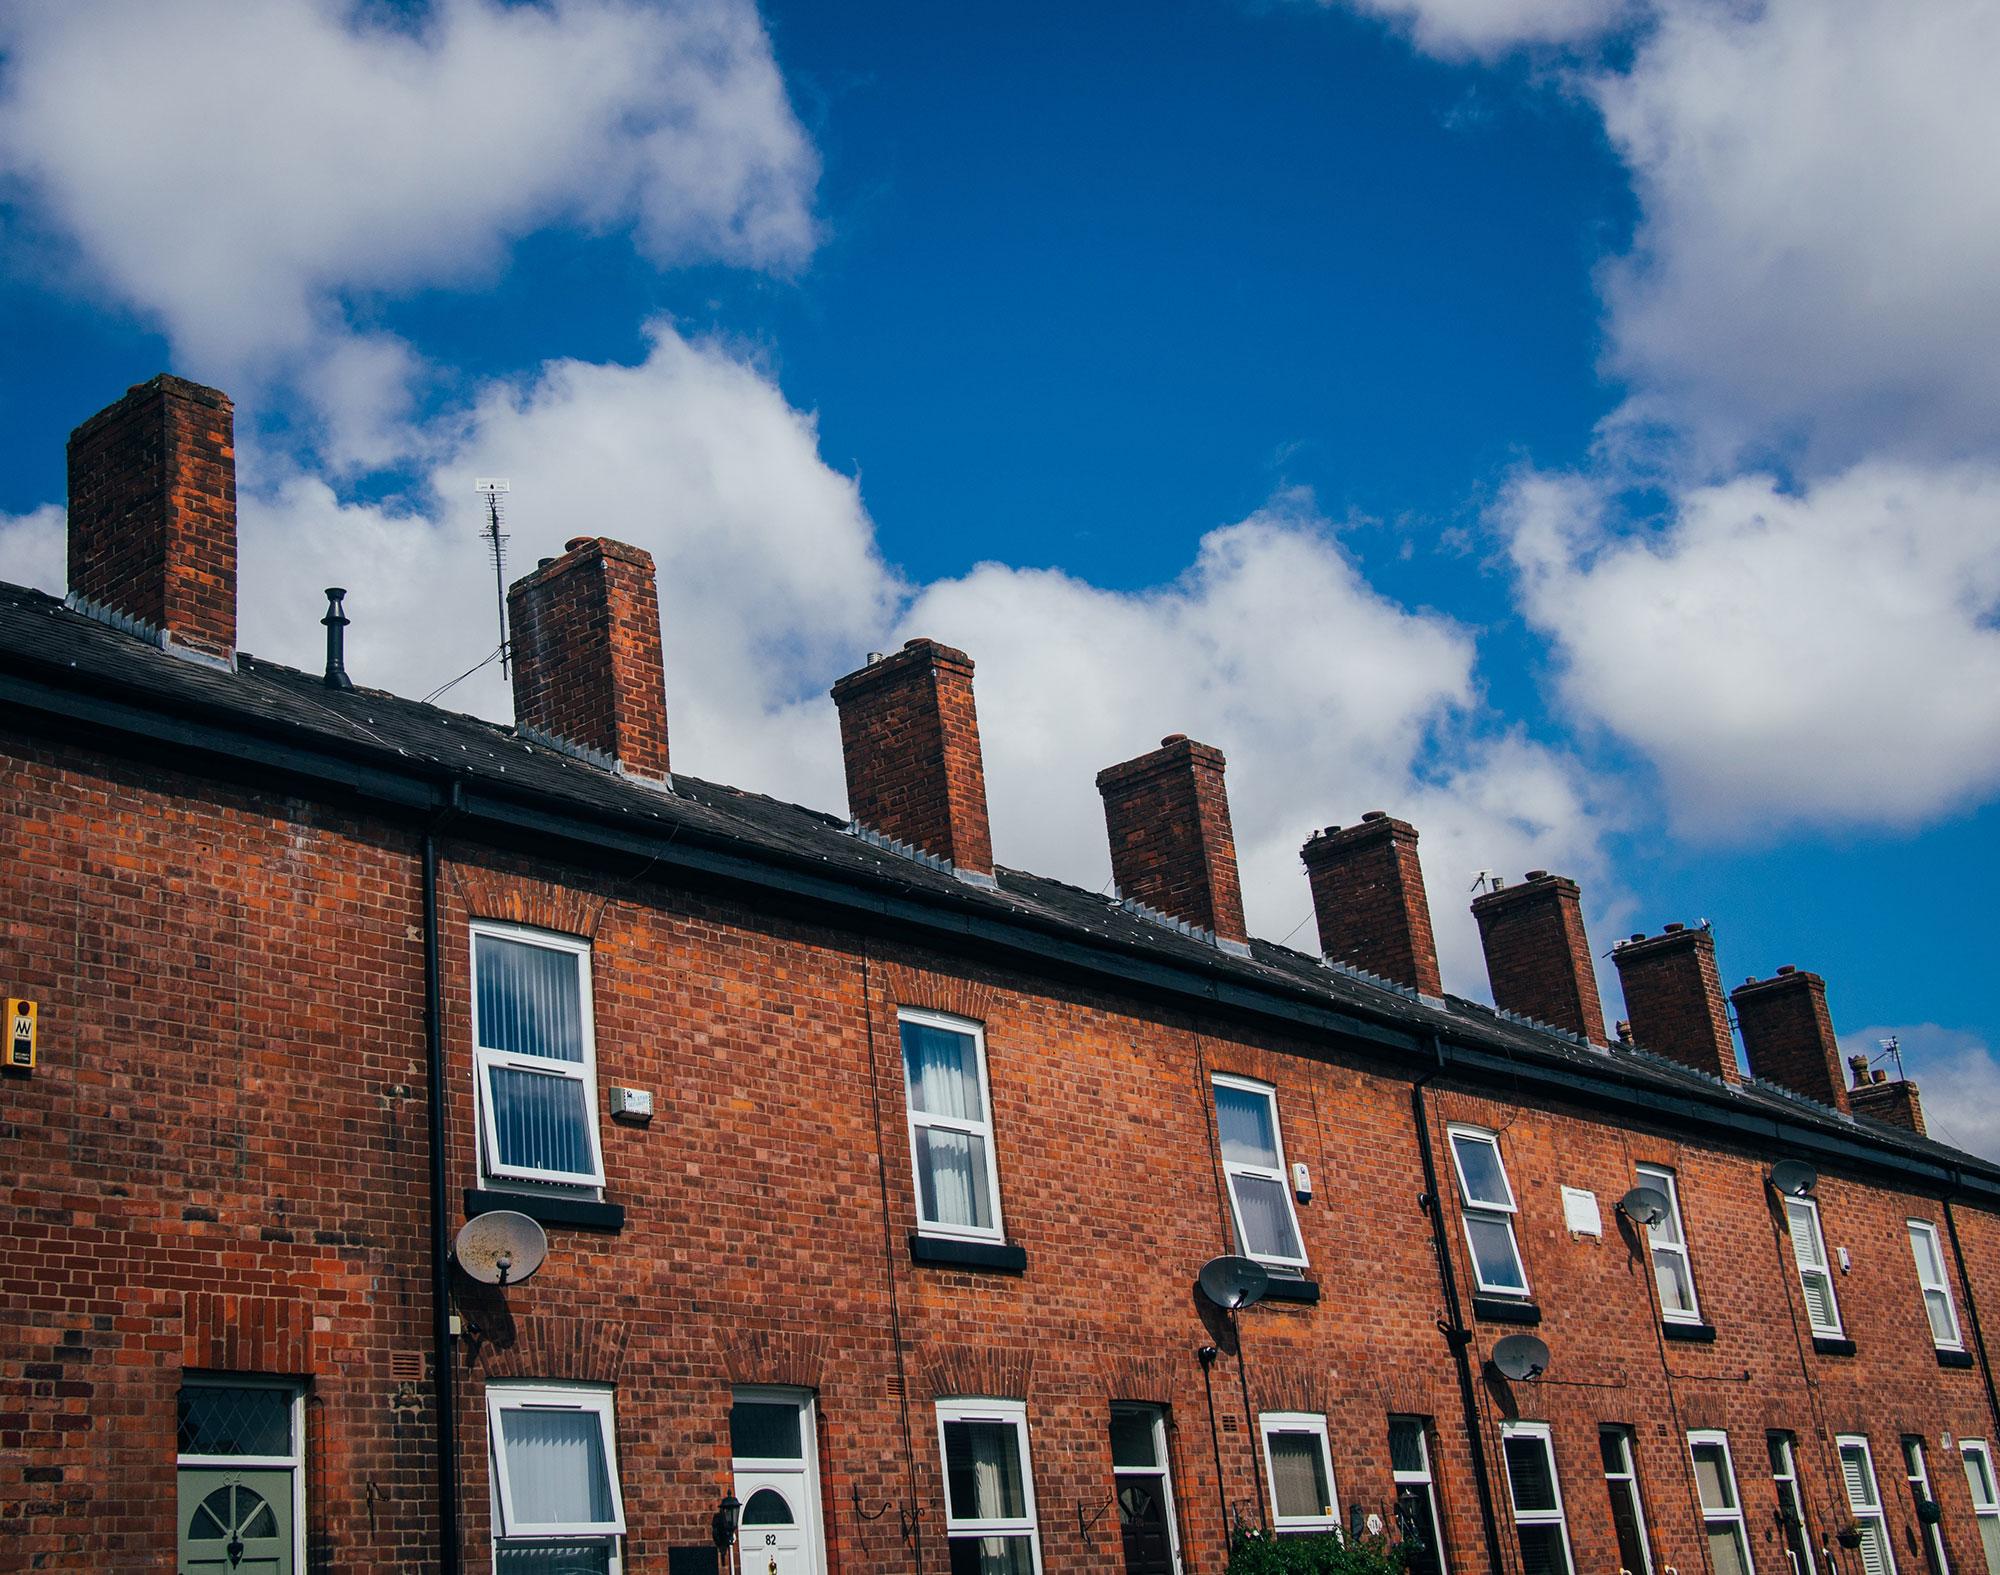 Terraced hoses with blue sky